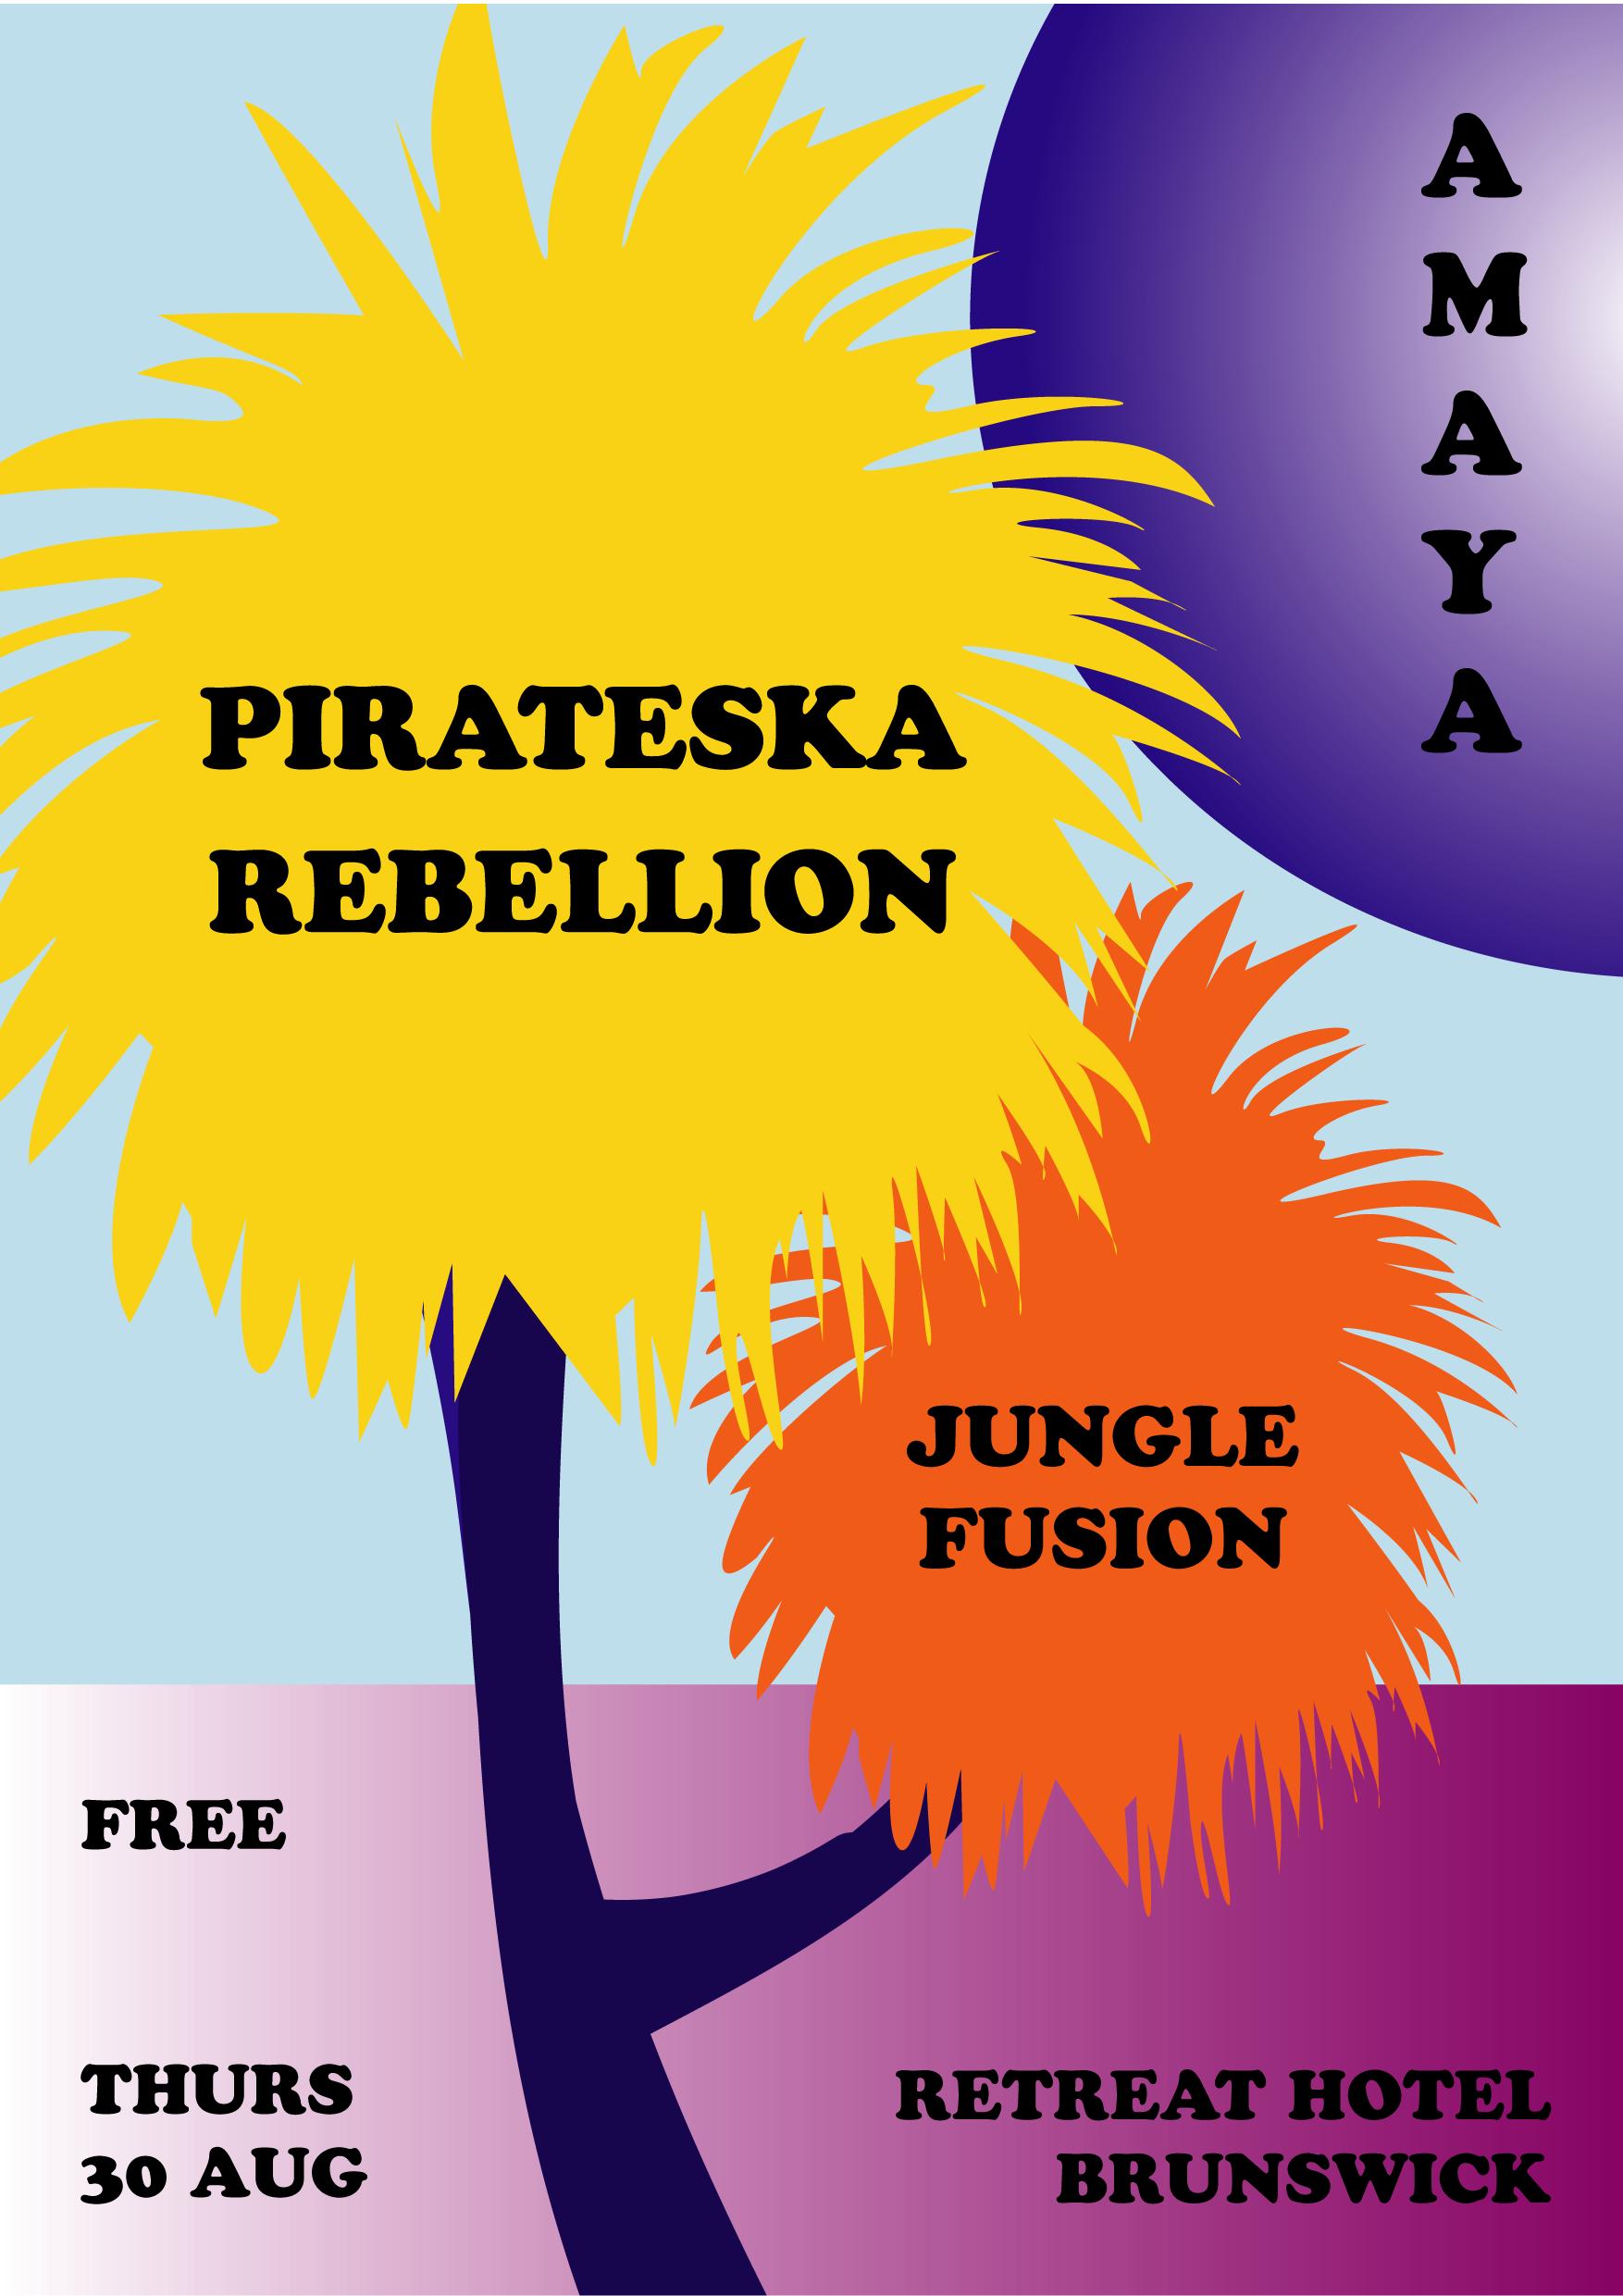 Pirateska Rebellion Online.png